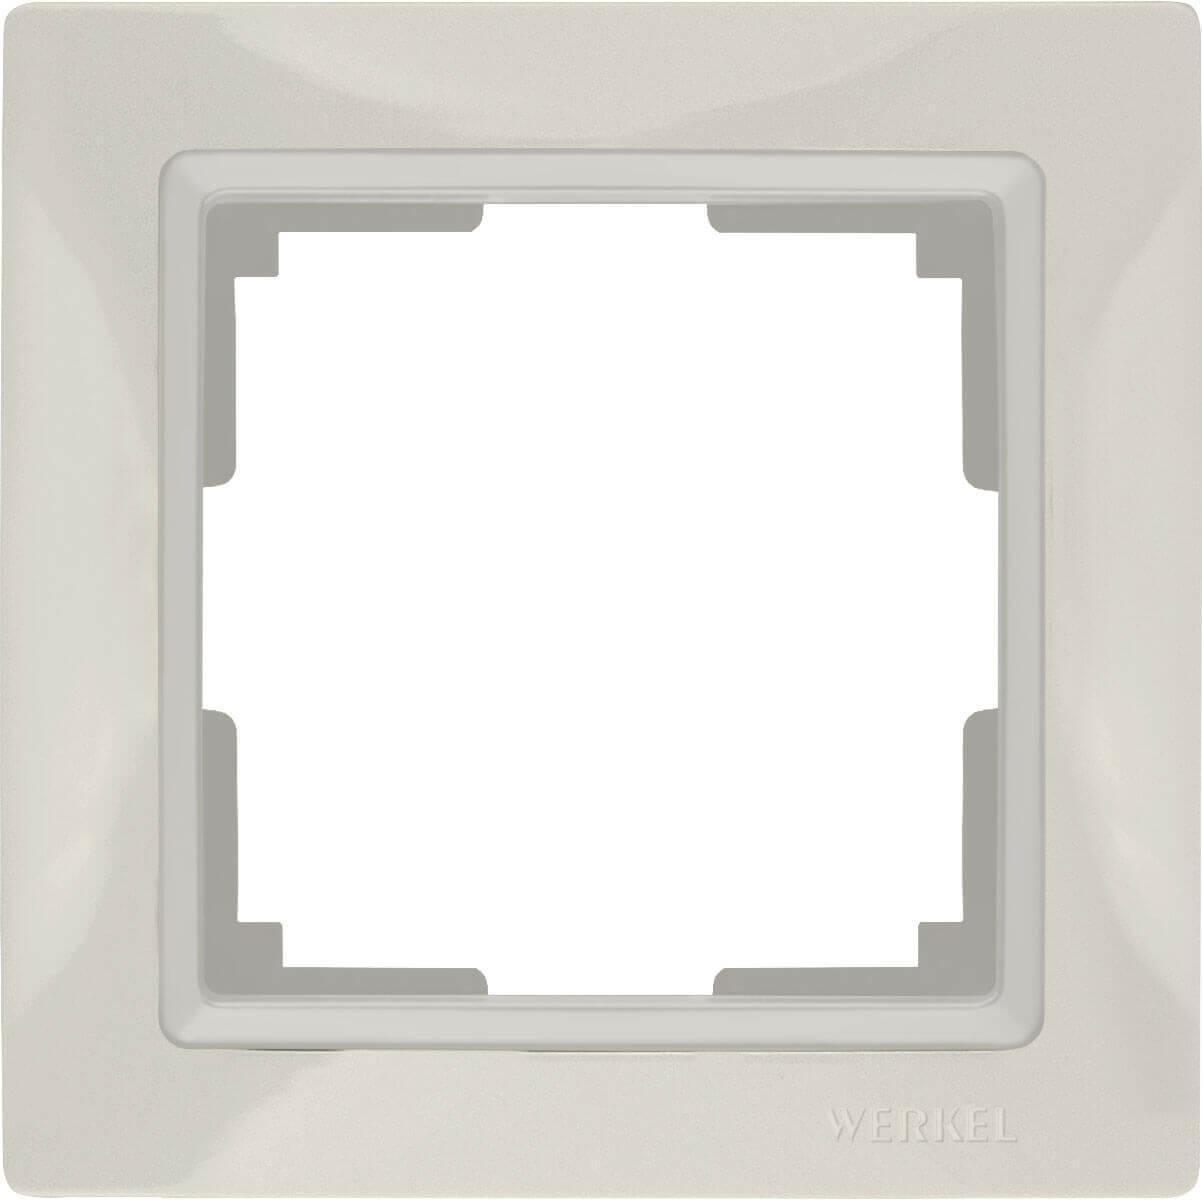 Рамка Werkel Snabb Basic на 1 пост слоновая кость WL03-Frame-01 4690389098703